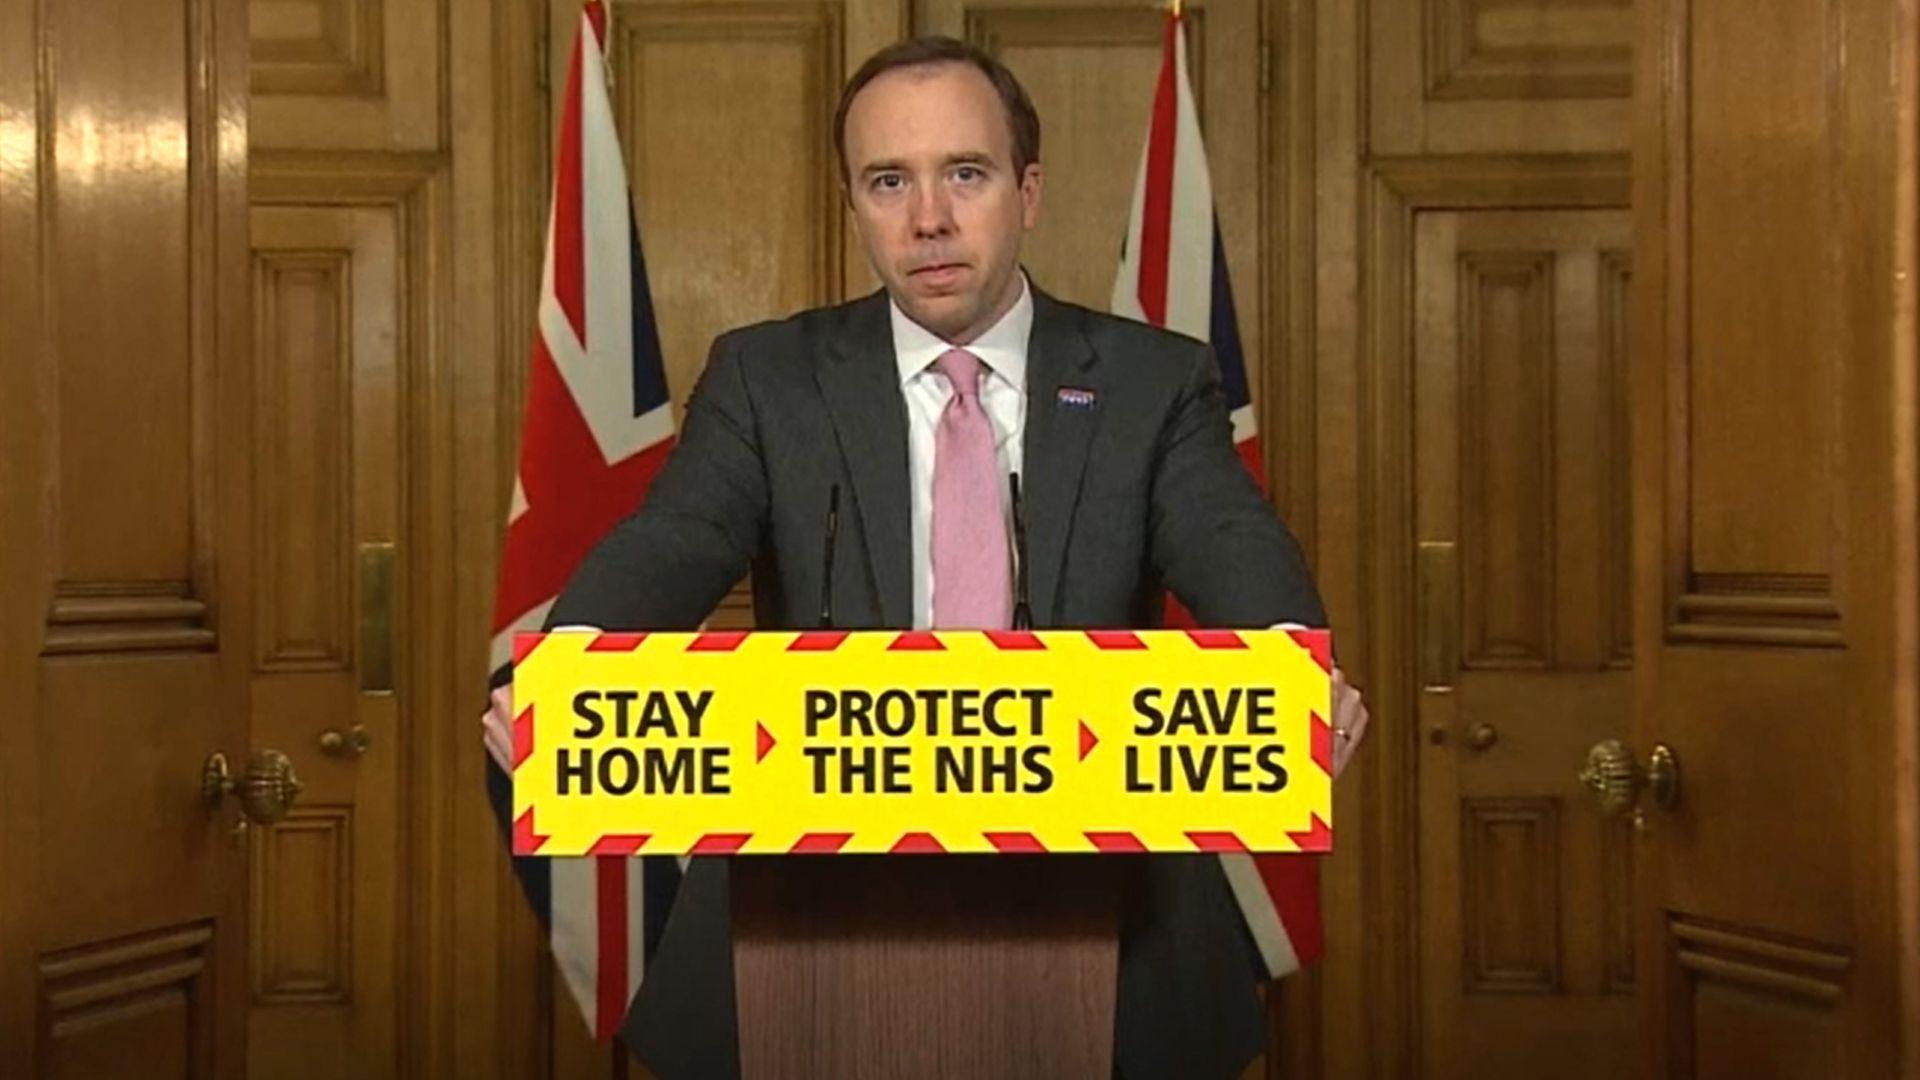 Health Secretary Matt Hancock during a media briefing on coronavirus (COVID-19) in Downing Street, London - Credit: PA